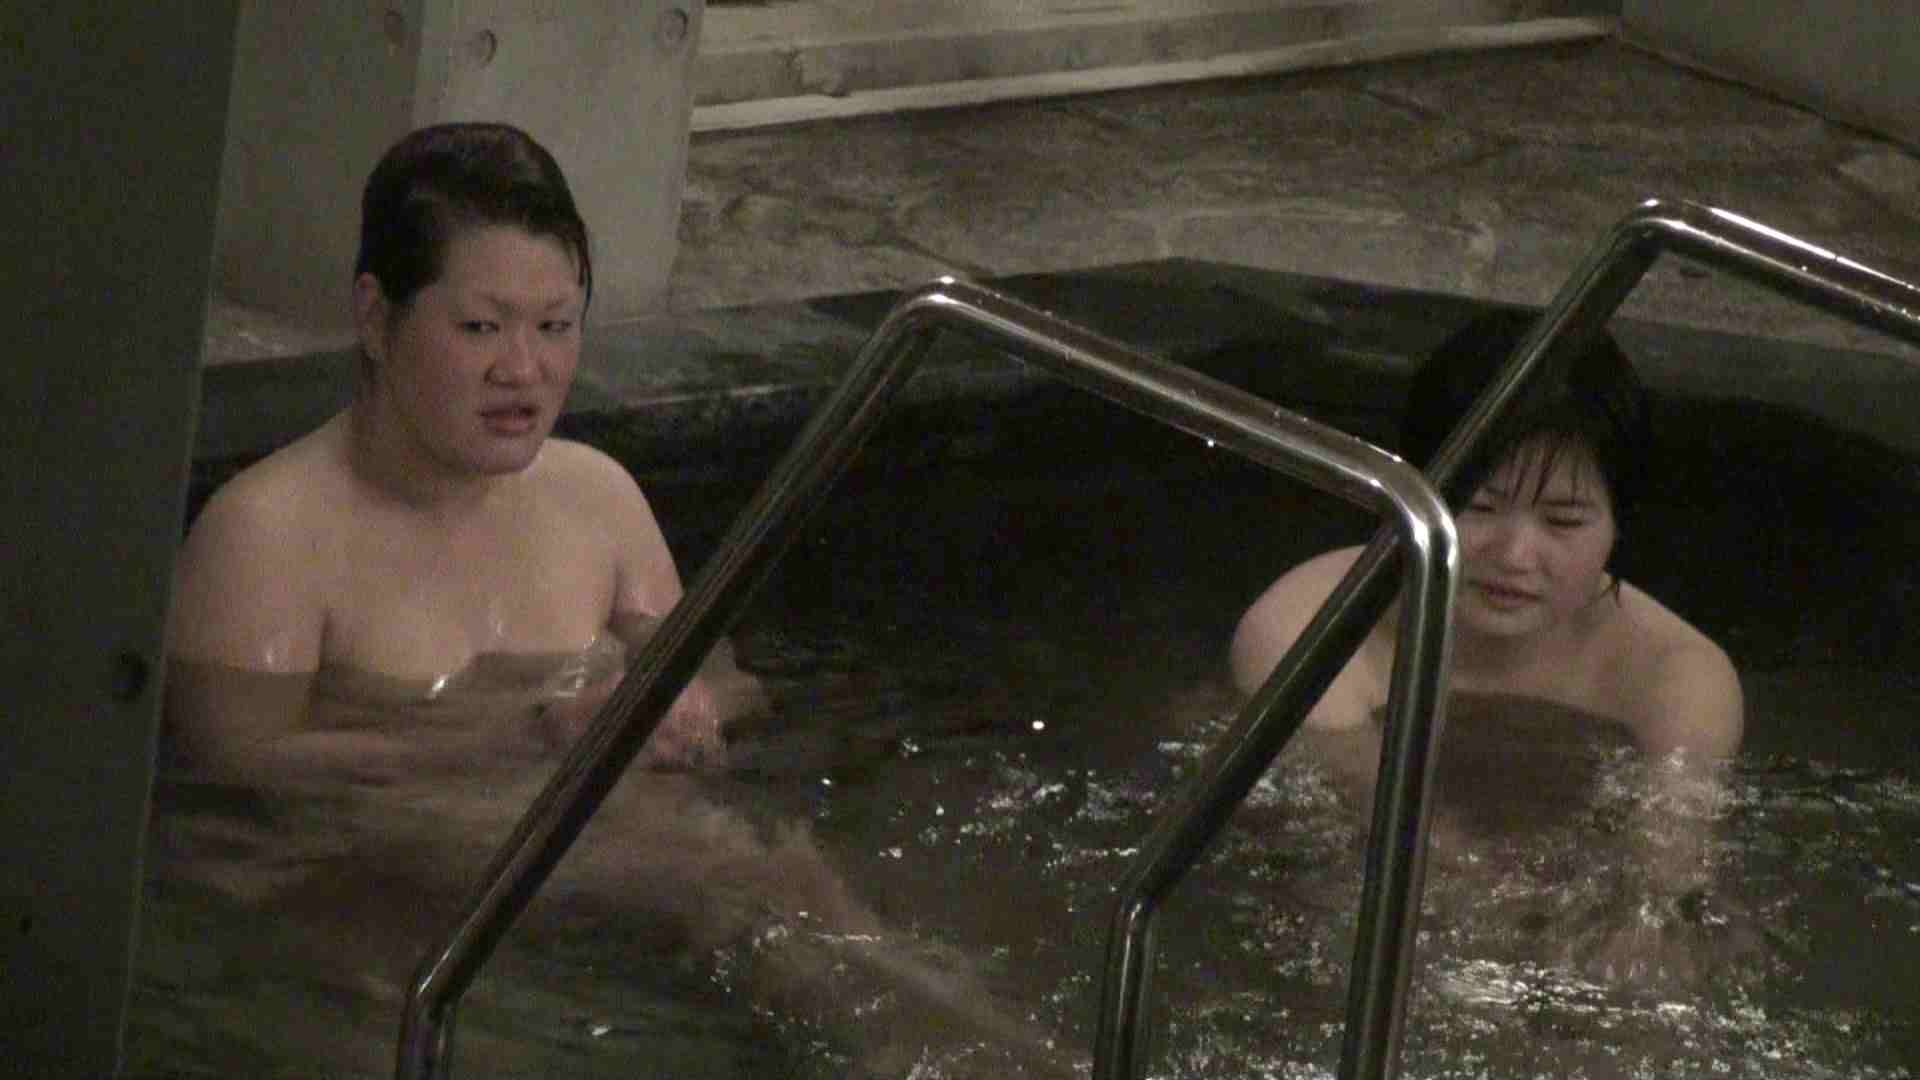 Aquaな露天風呂Vol.384 OLセックス  60画像 42